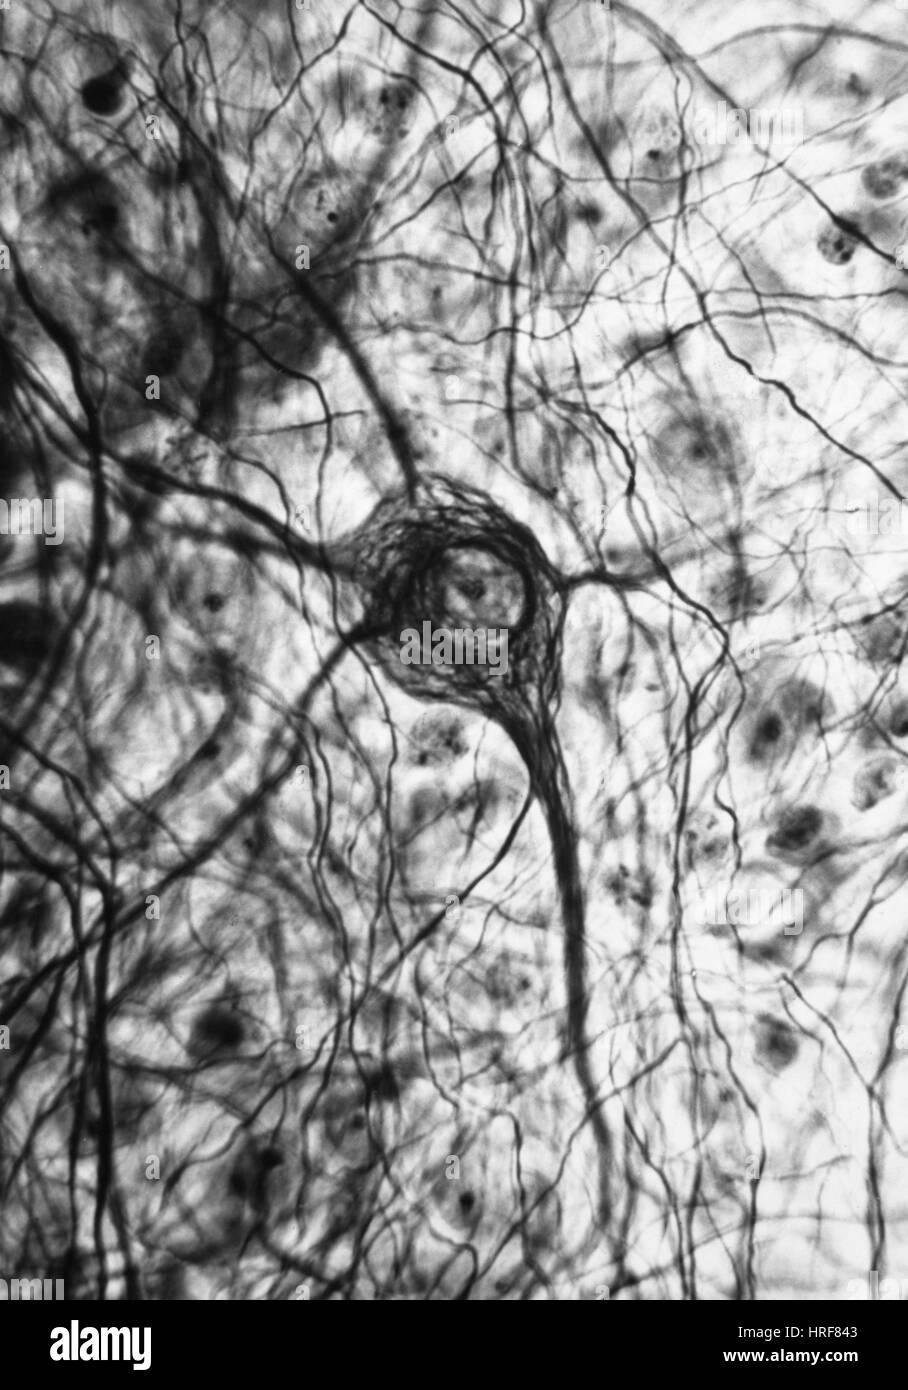 Neuron, TEM - Stock Image